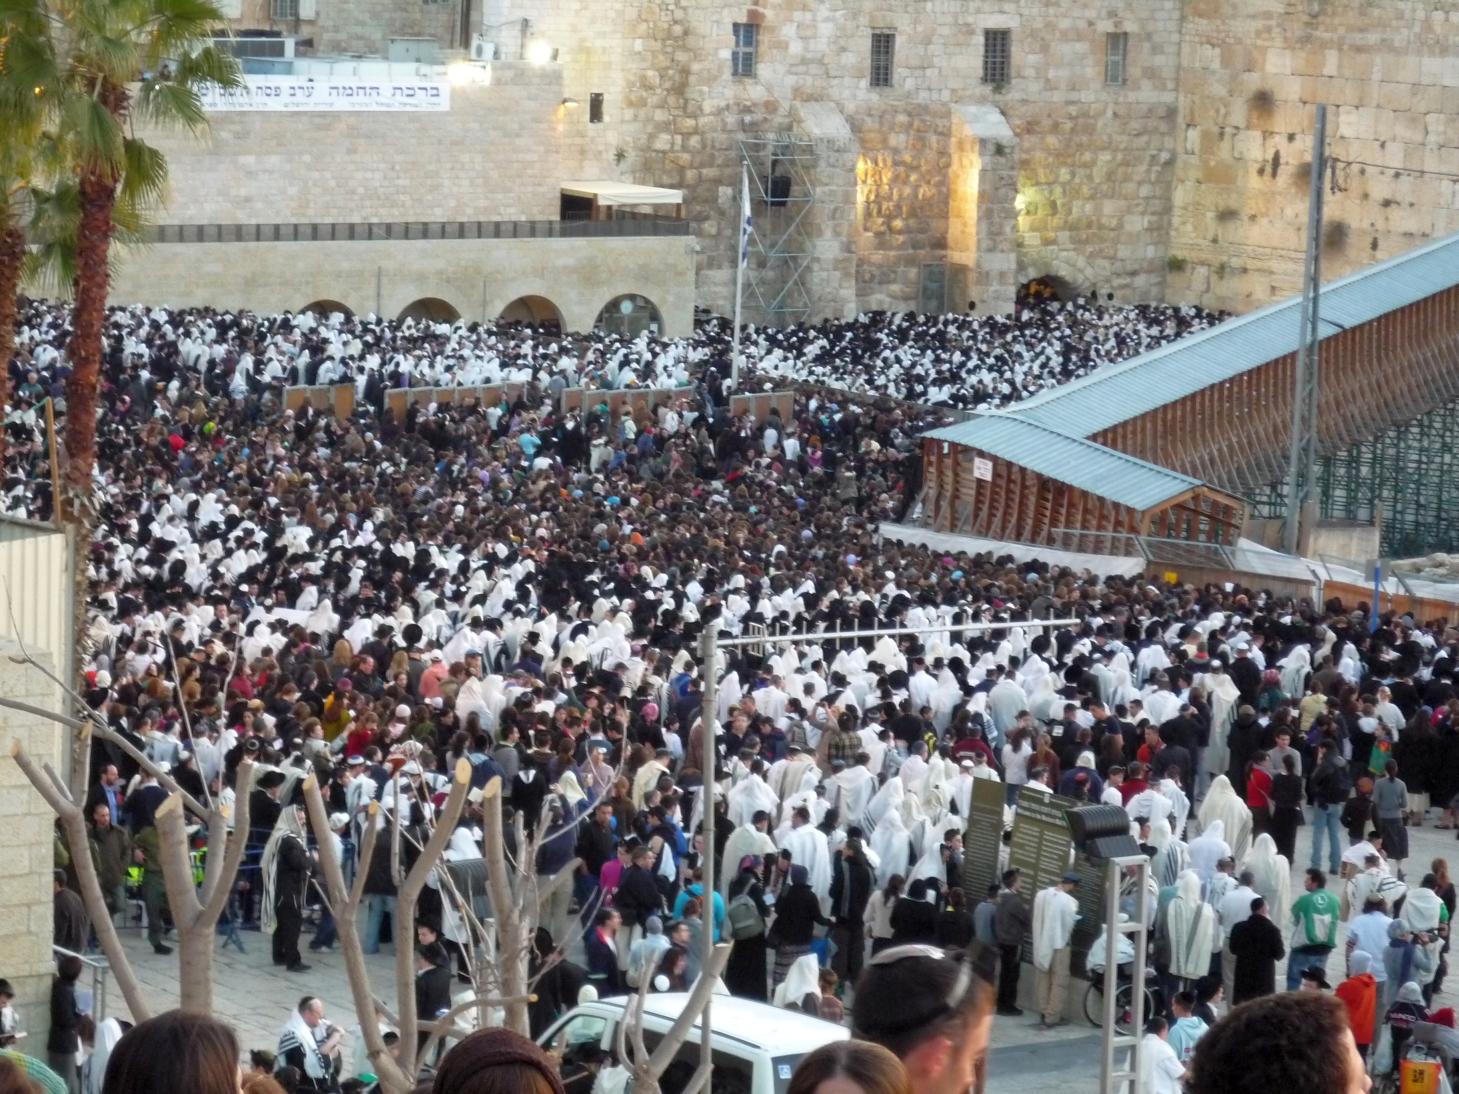 Western Wall Birkat Hachama 8 April 2009 2